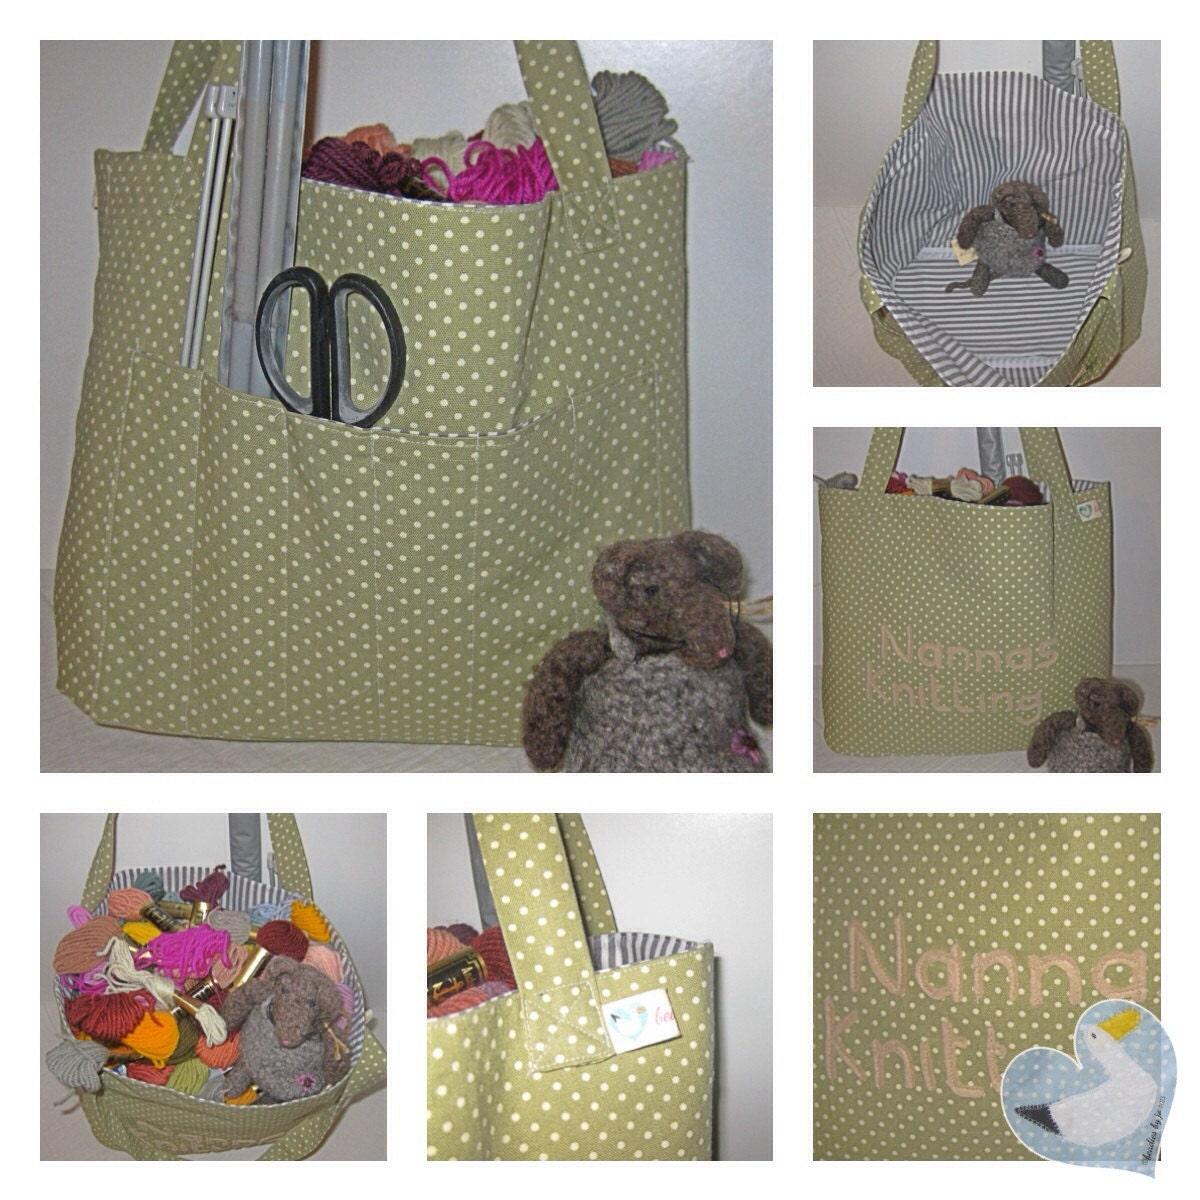 Knitting  Bag Sewing Bag Shopping Bag Pic Nic Bag Baby Bag Dog Bag